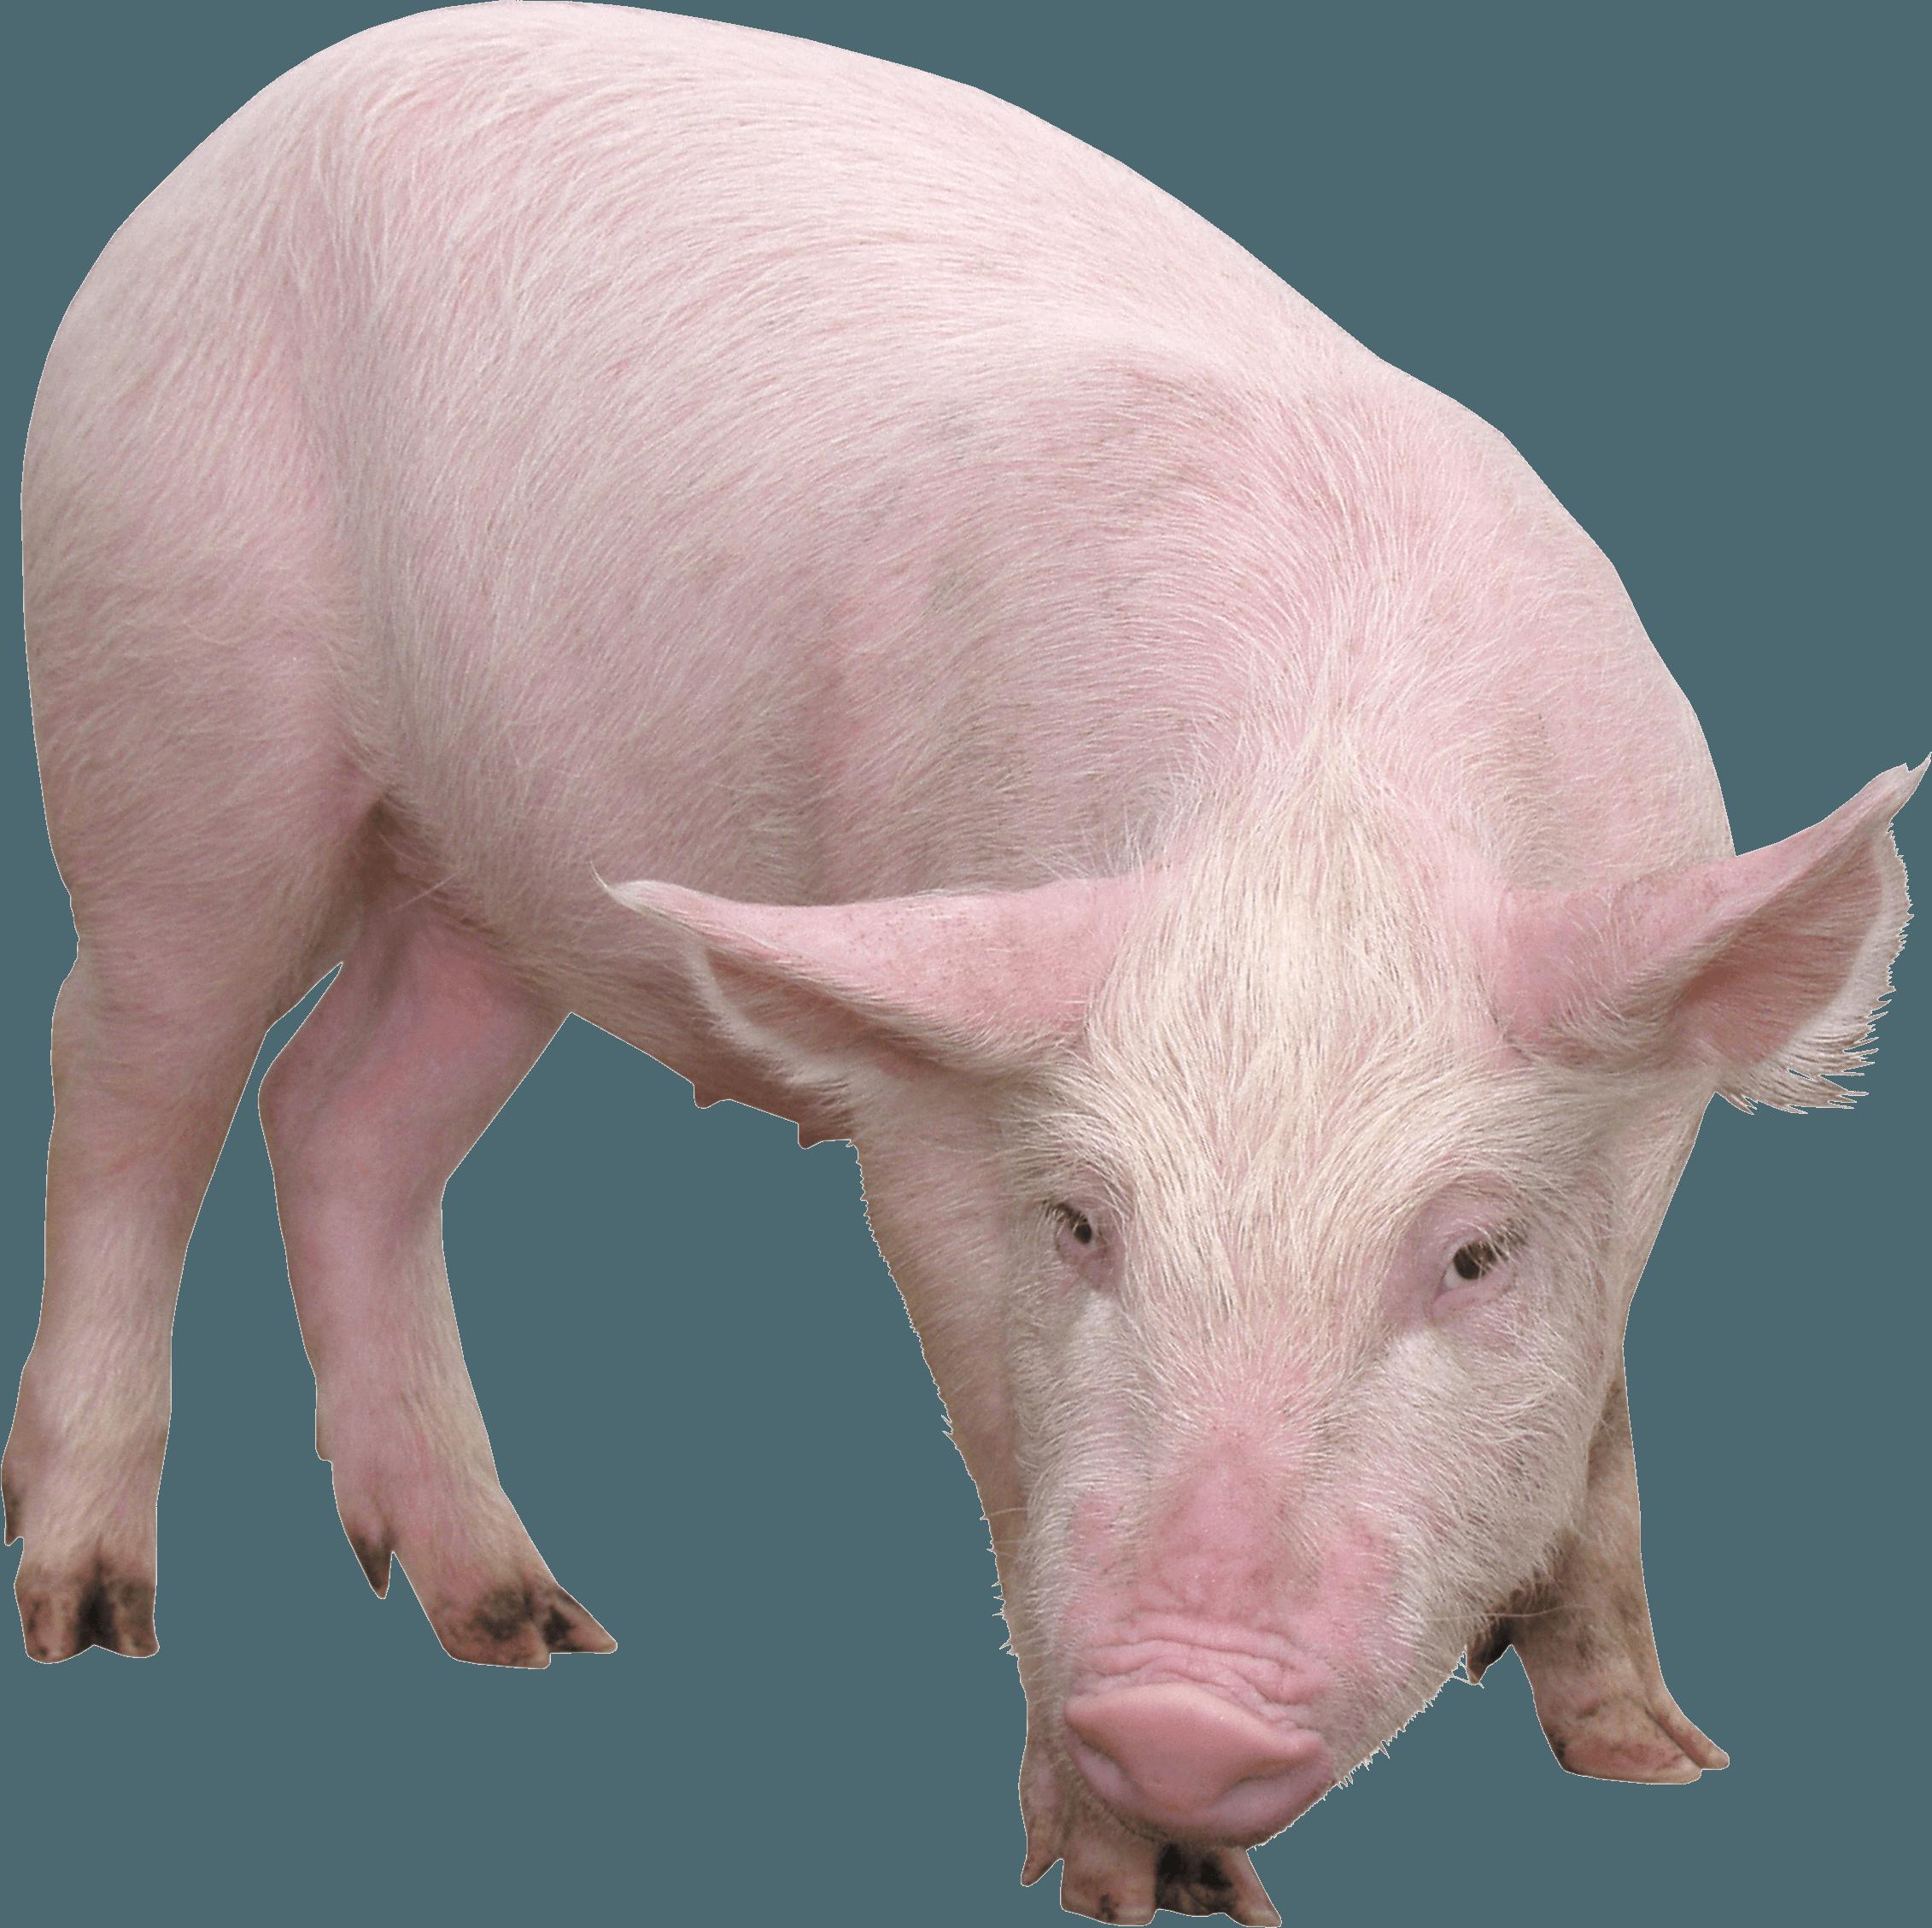 Pig PNG Image